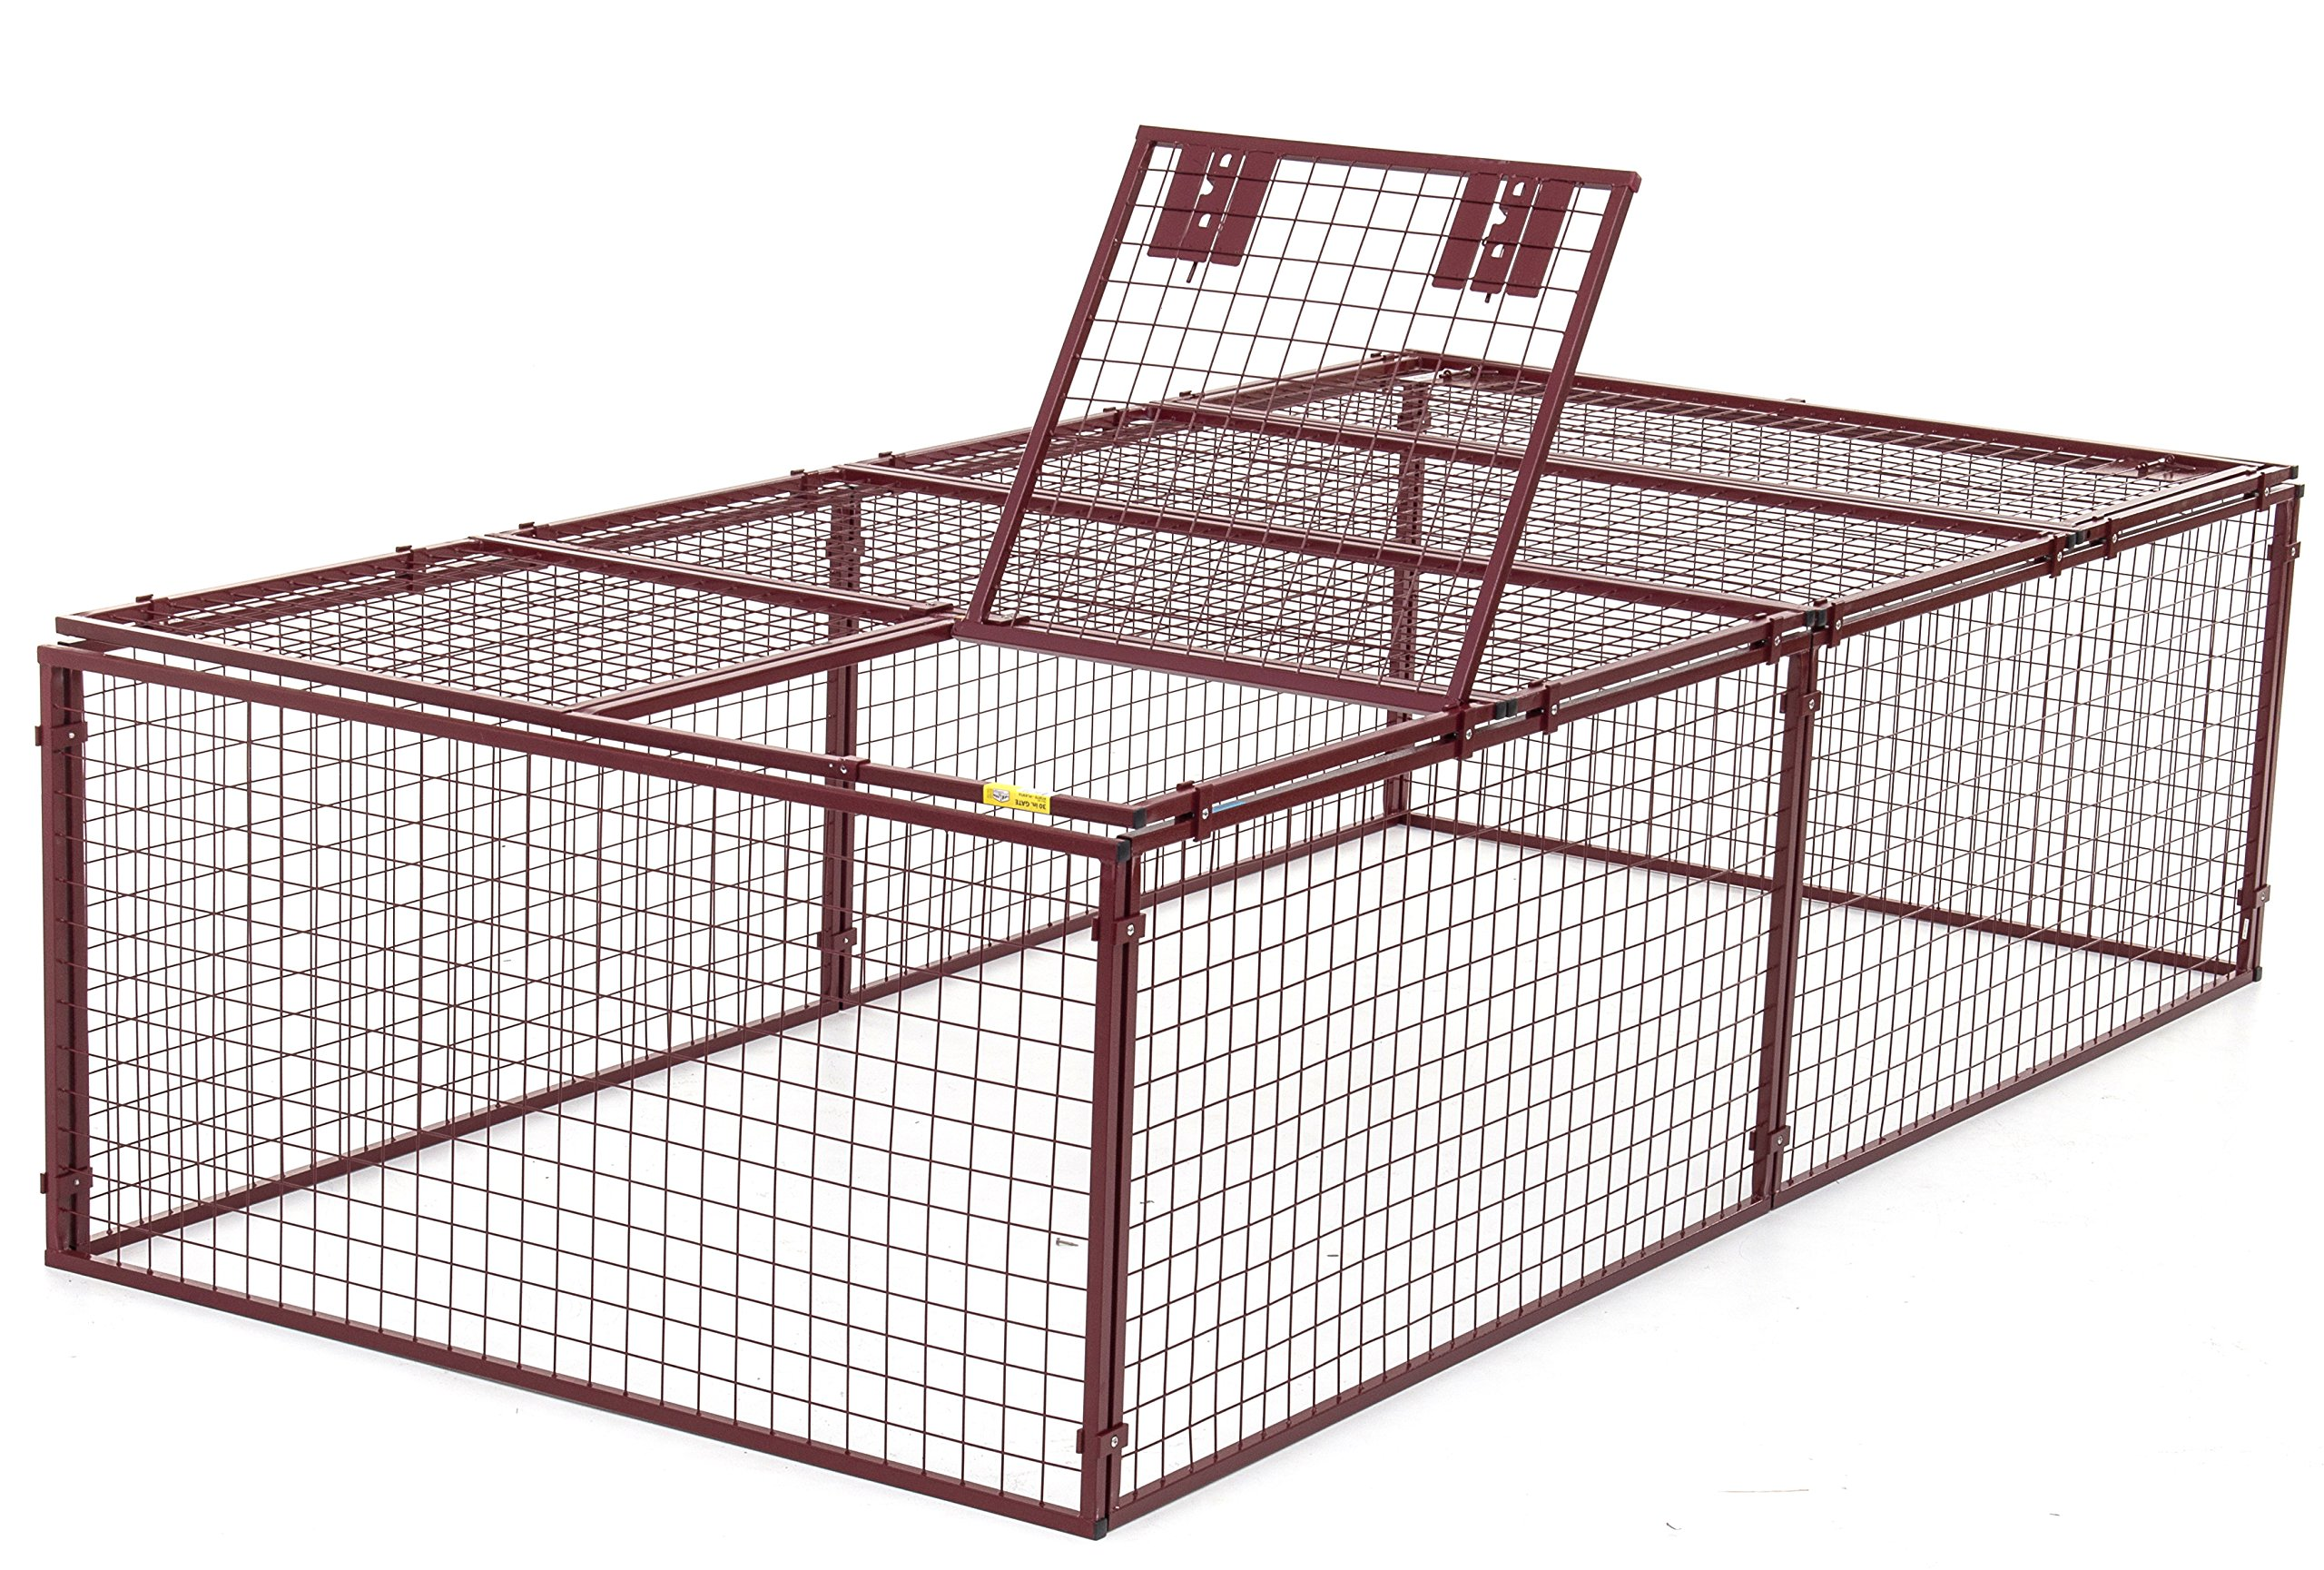 Animal House Heavy Duty Outdoor Kennel Predator Proof (2.5' Hx10'Lx5'W) 116.8 lbs